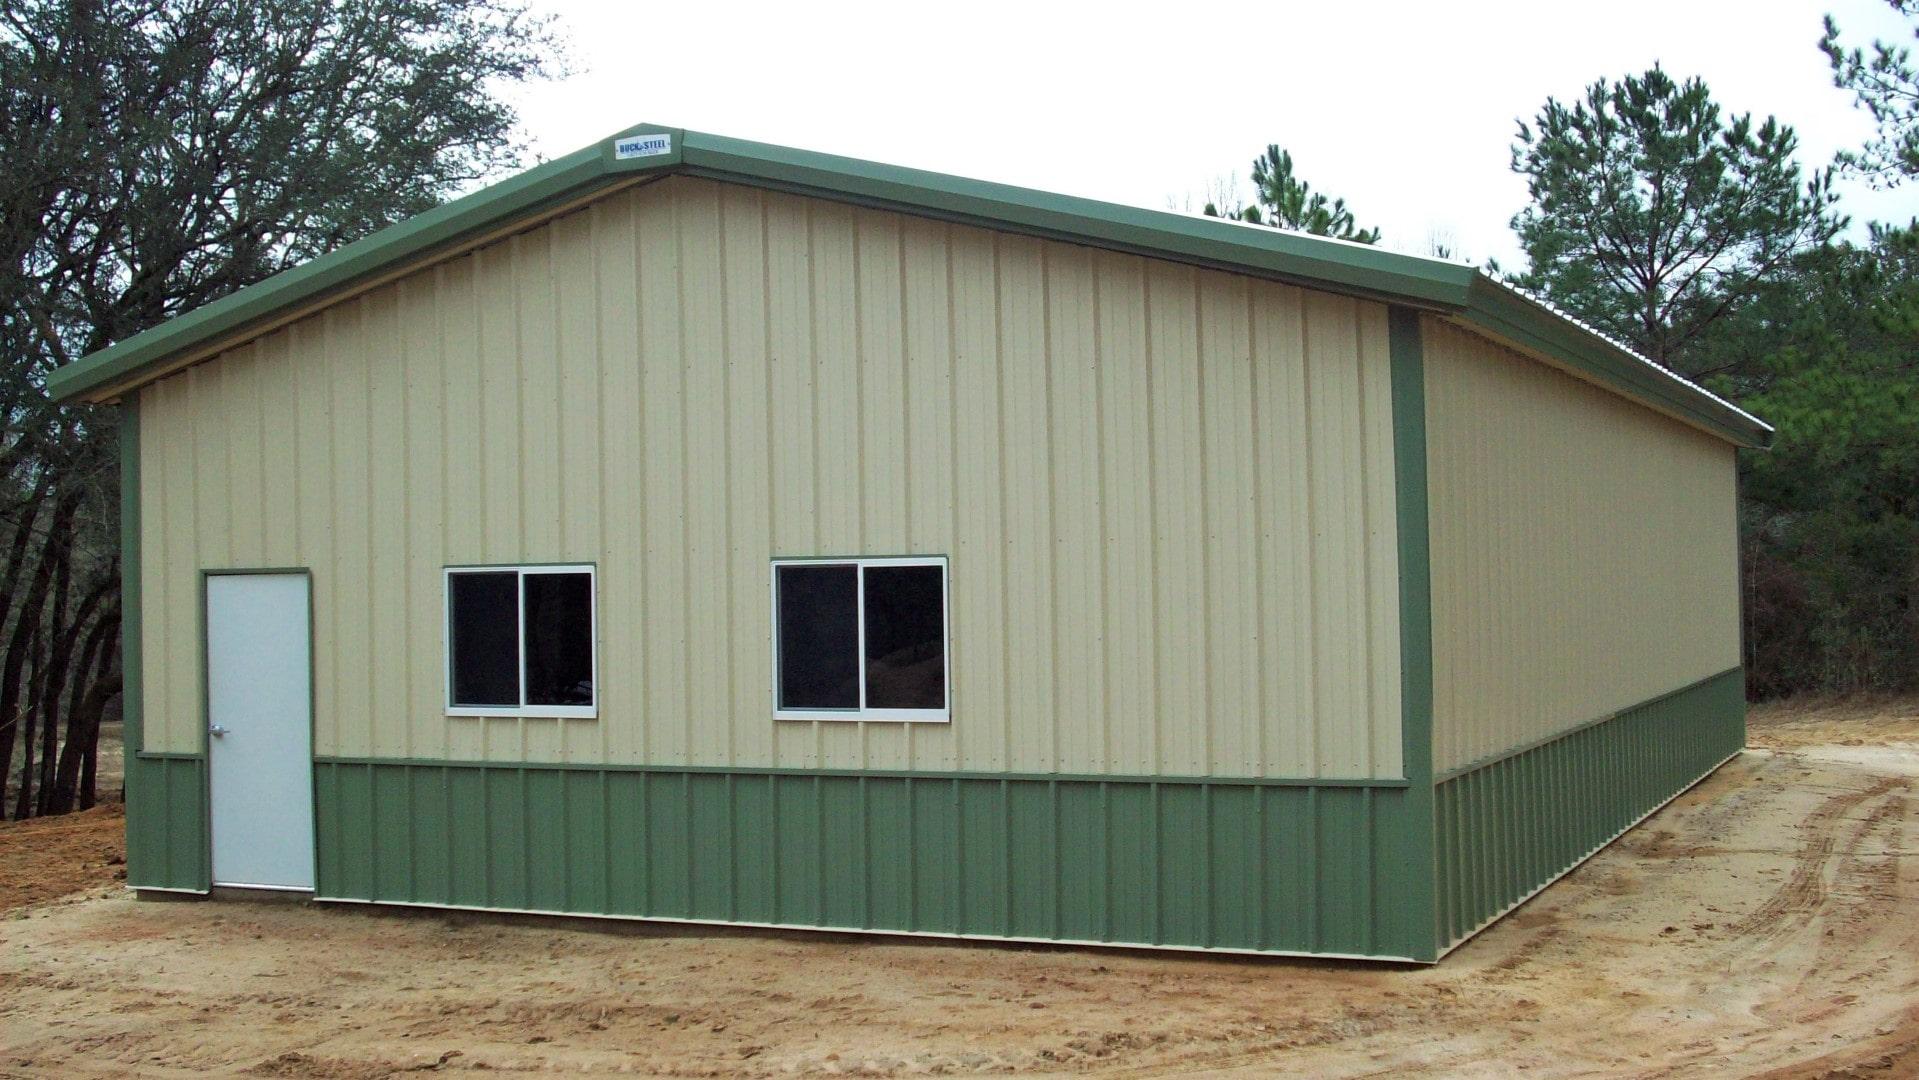 Tan metal garage with green trim, green wainscoting, walk door and windows. View of right endwall.